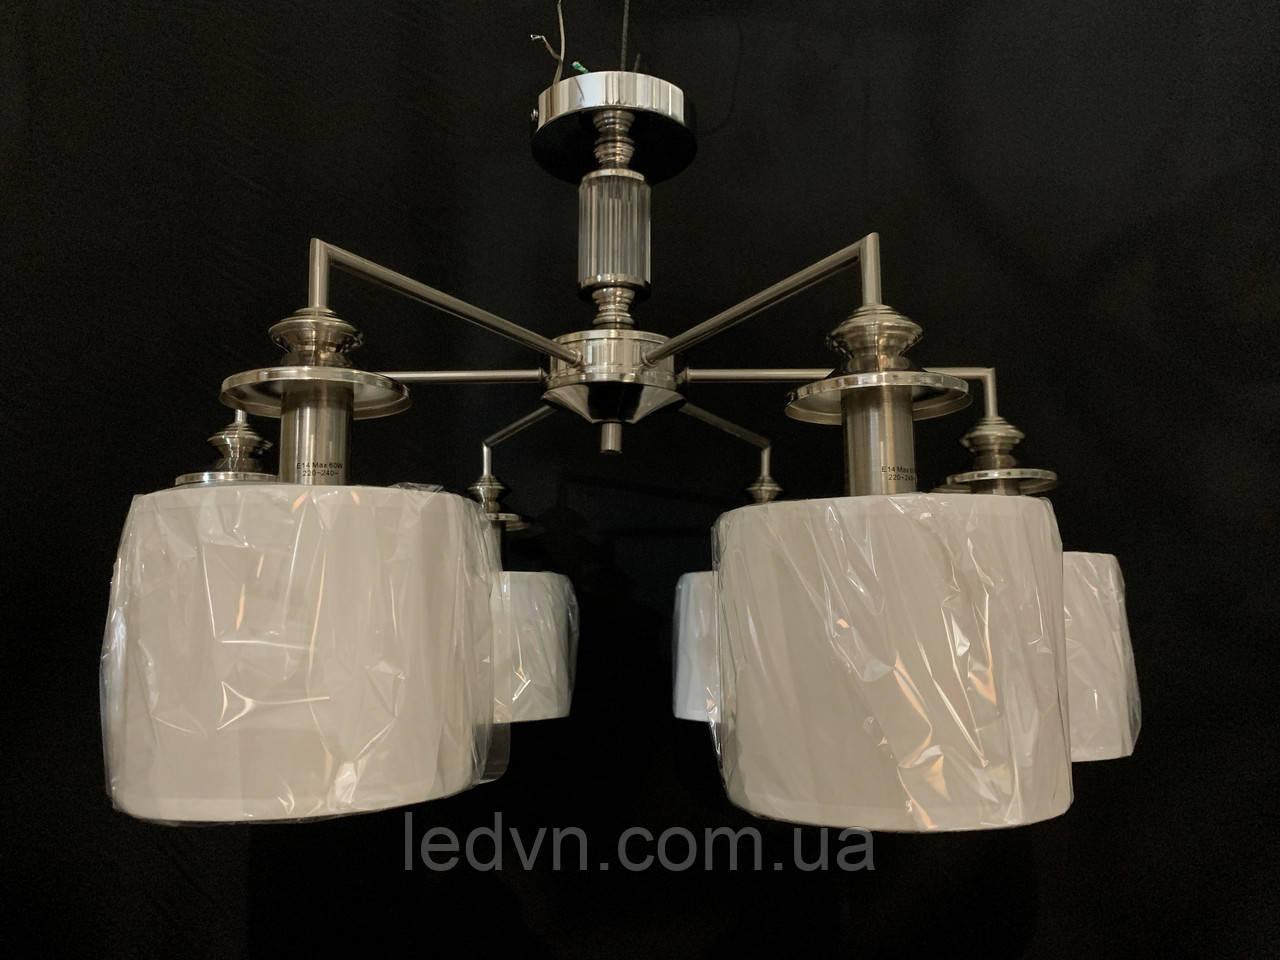 Класична стельова люстра з абажурами на 6 ламп